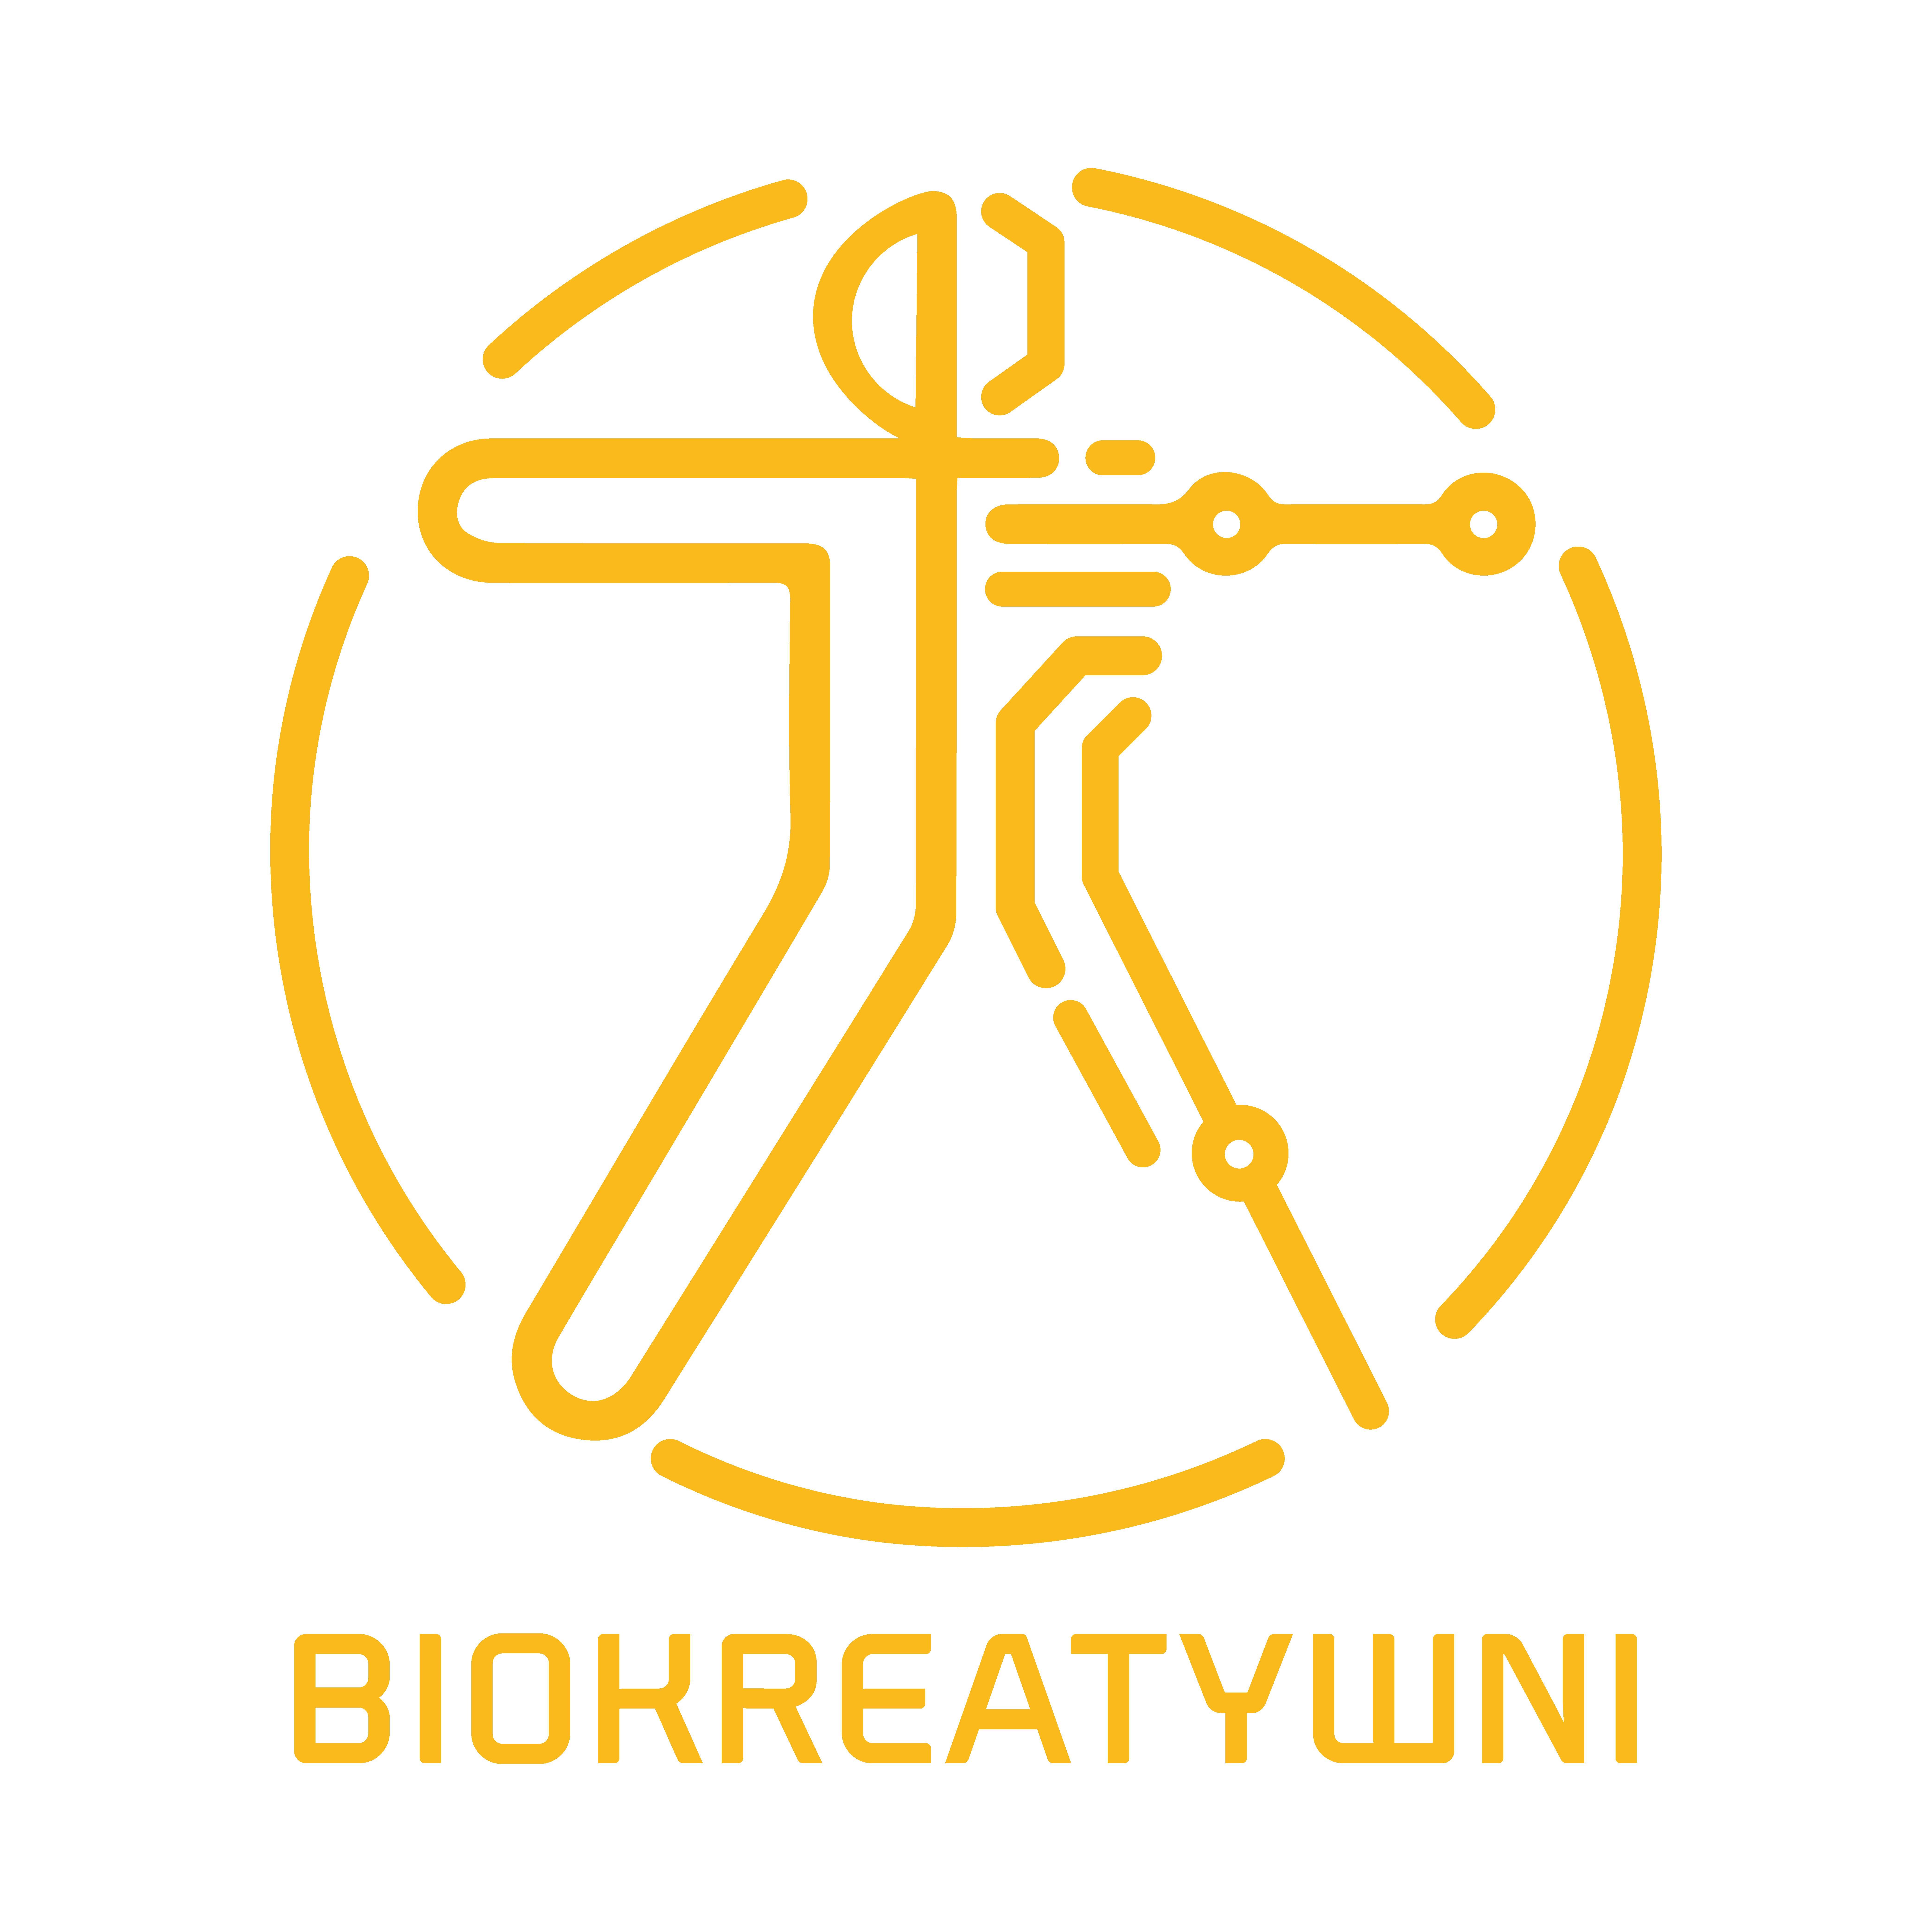 SKN Biokretywni